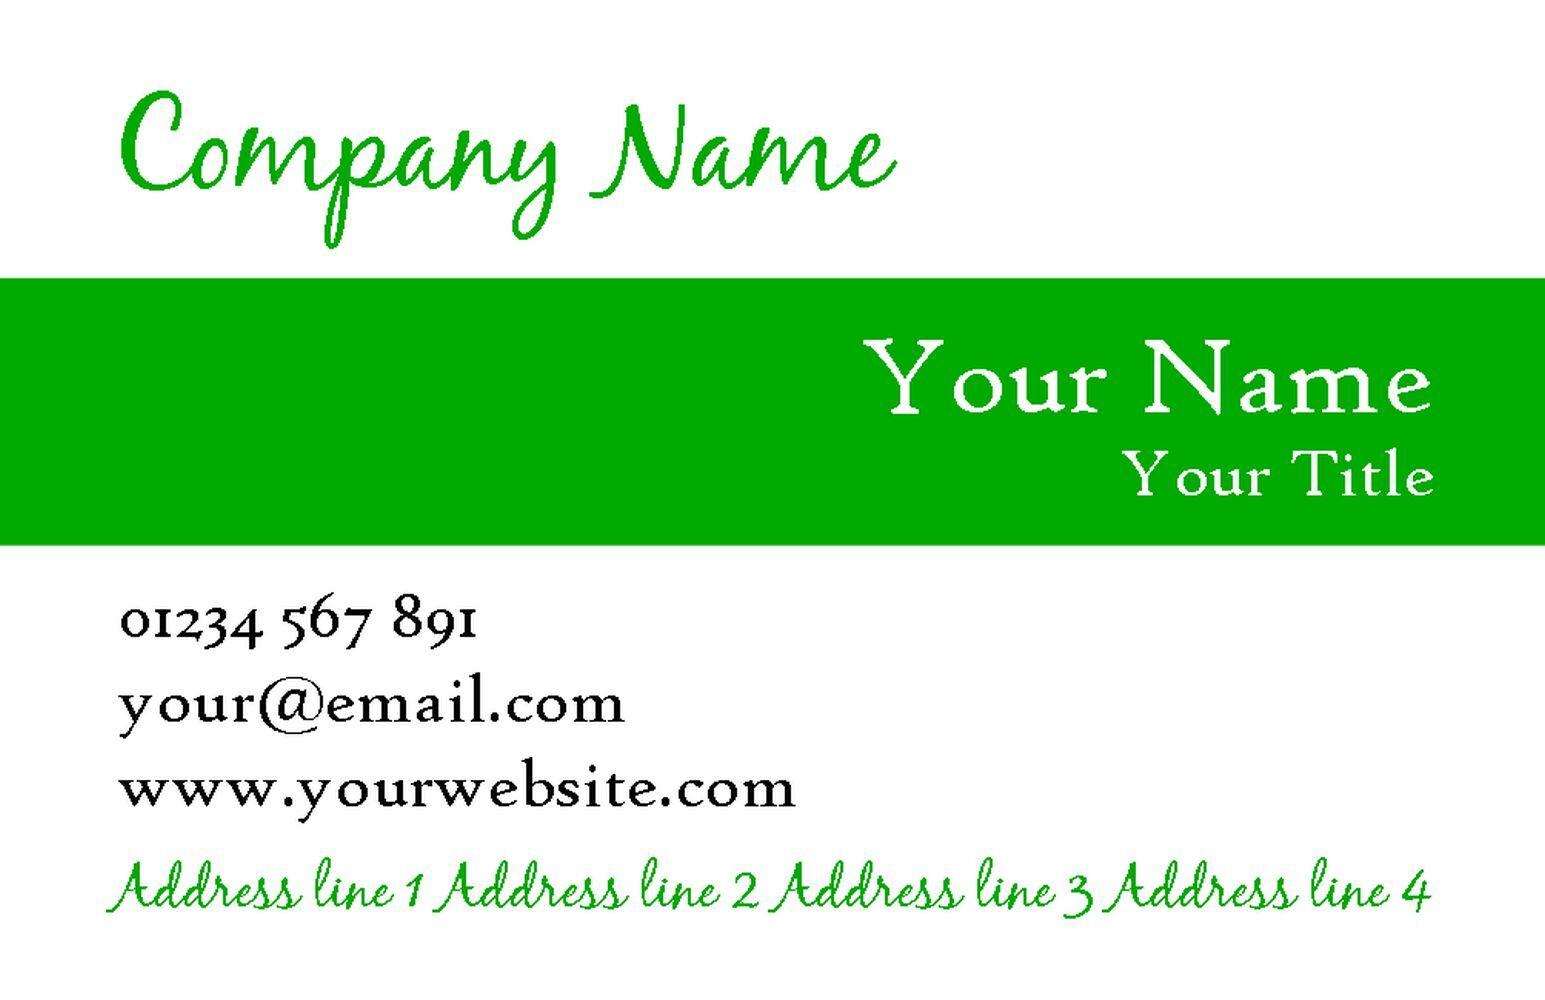 Weiß Weiß Weiß With Grün Stripe Personalised Business Cards 6203fb